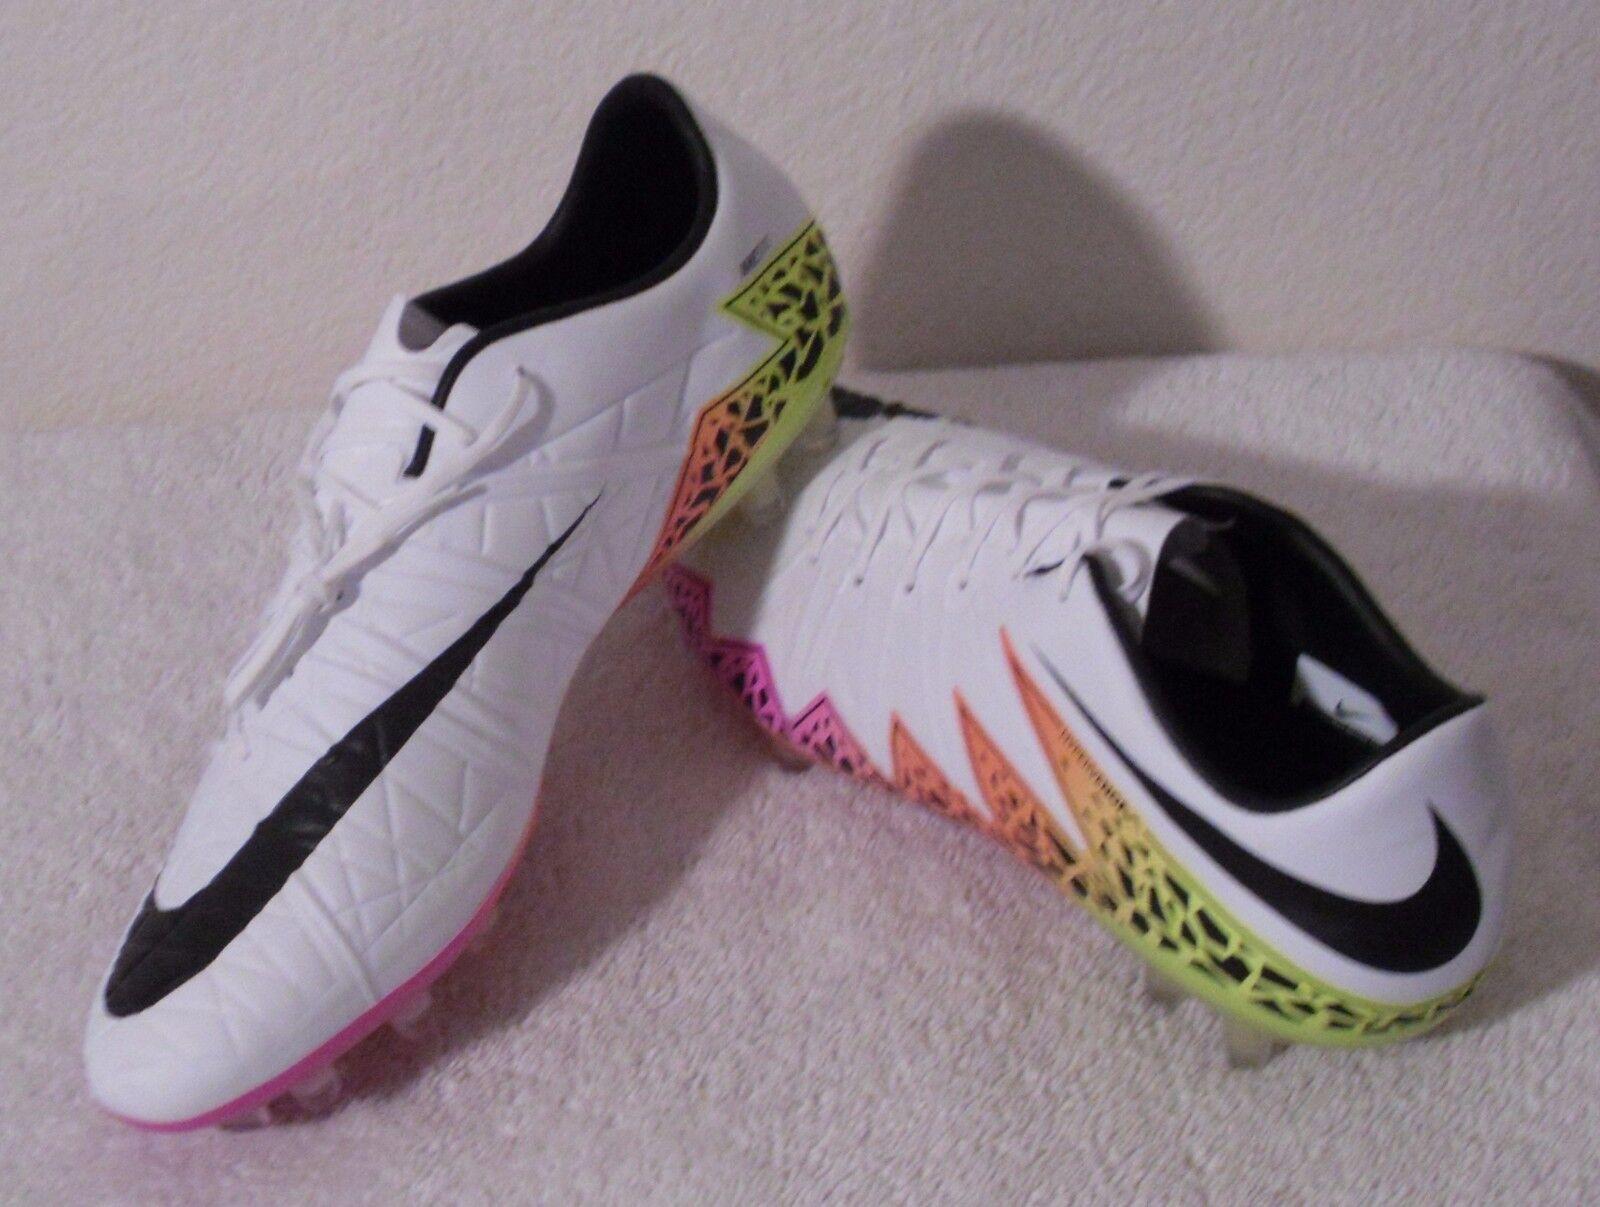 Nuevo Nike Hypervenom phinnish FG Hombre Botines De Fútbol 11.5 blancoo Naranja total  200